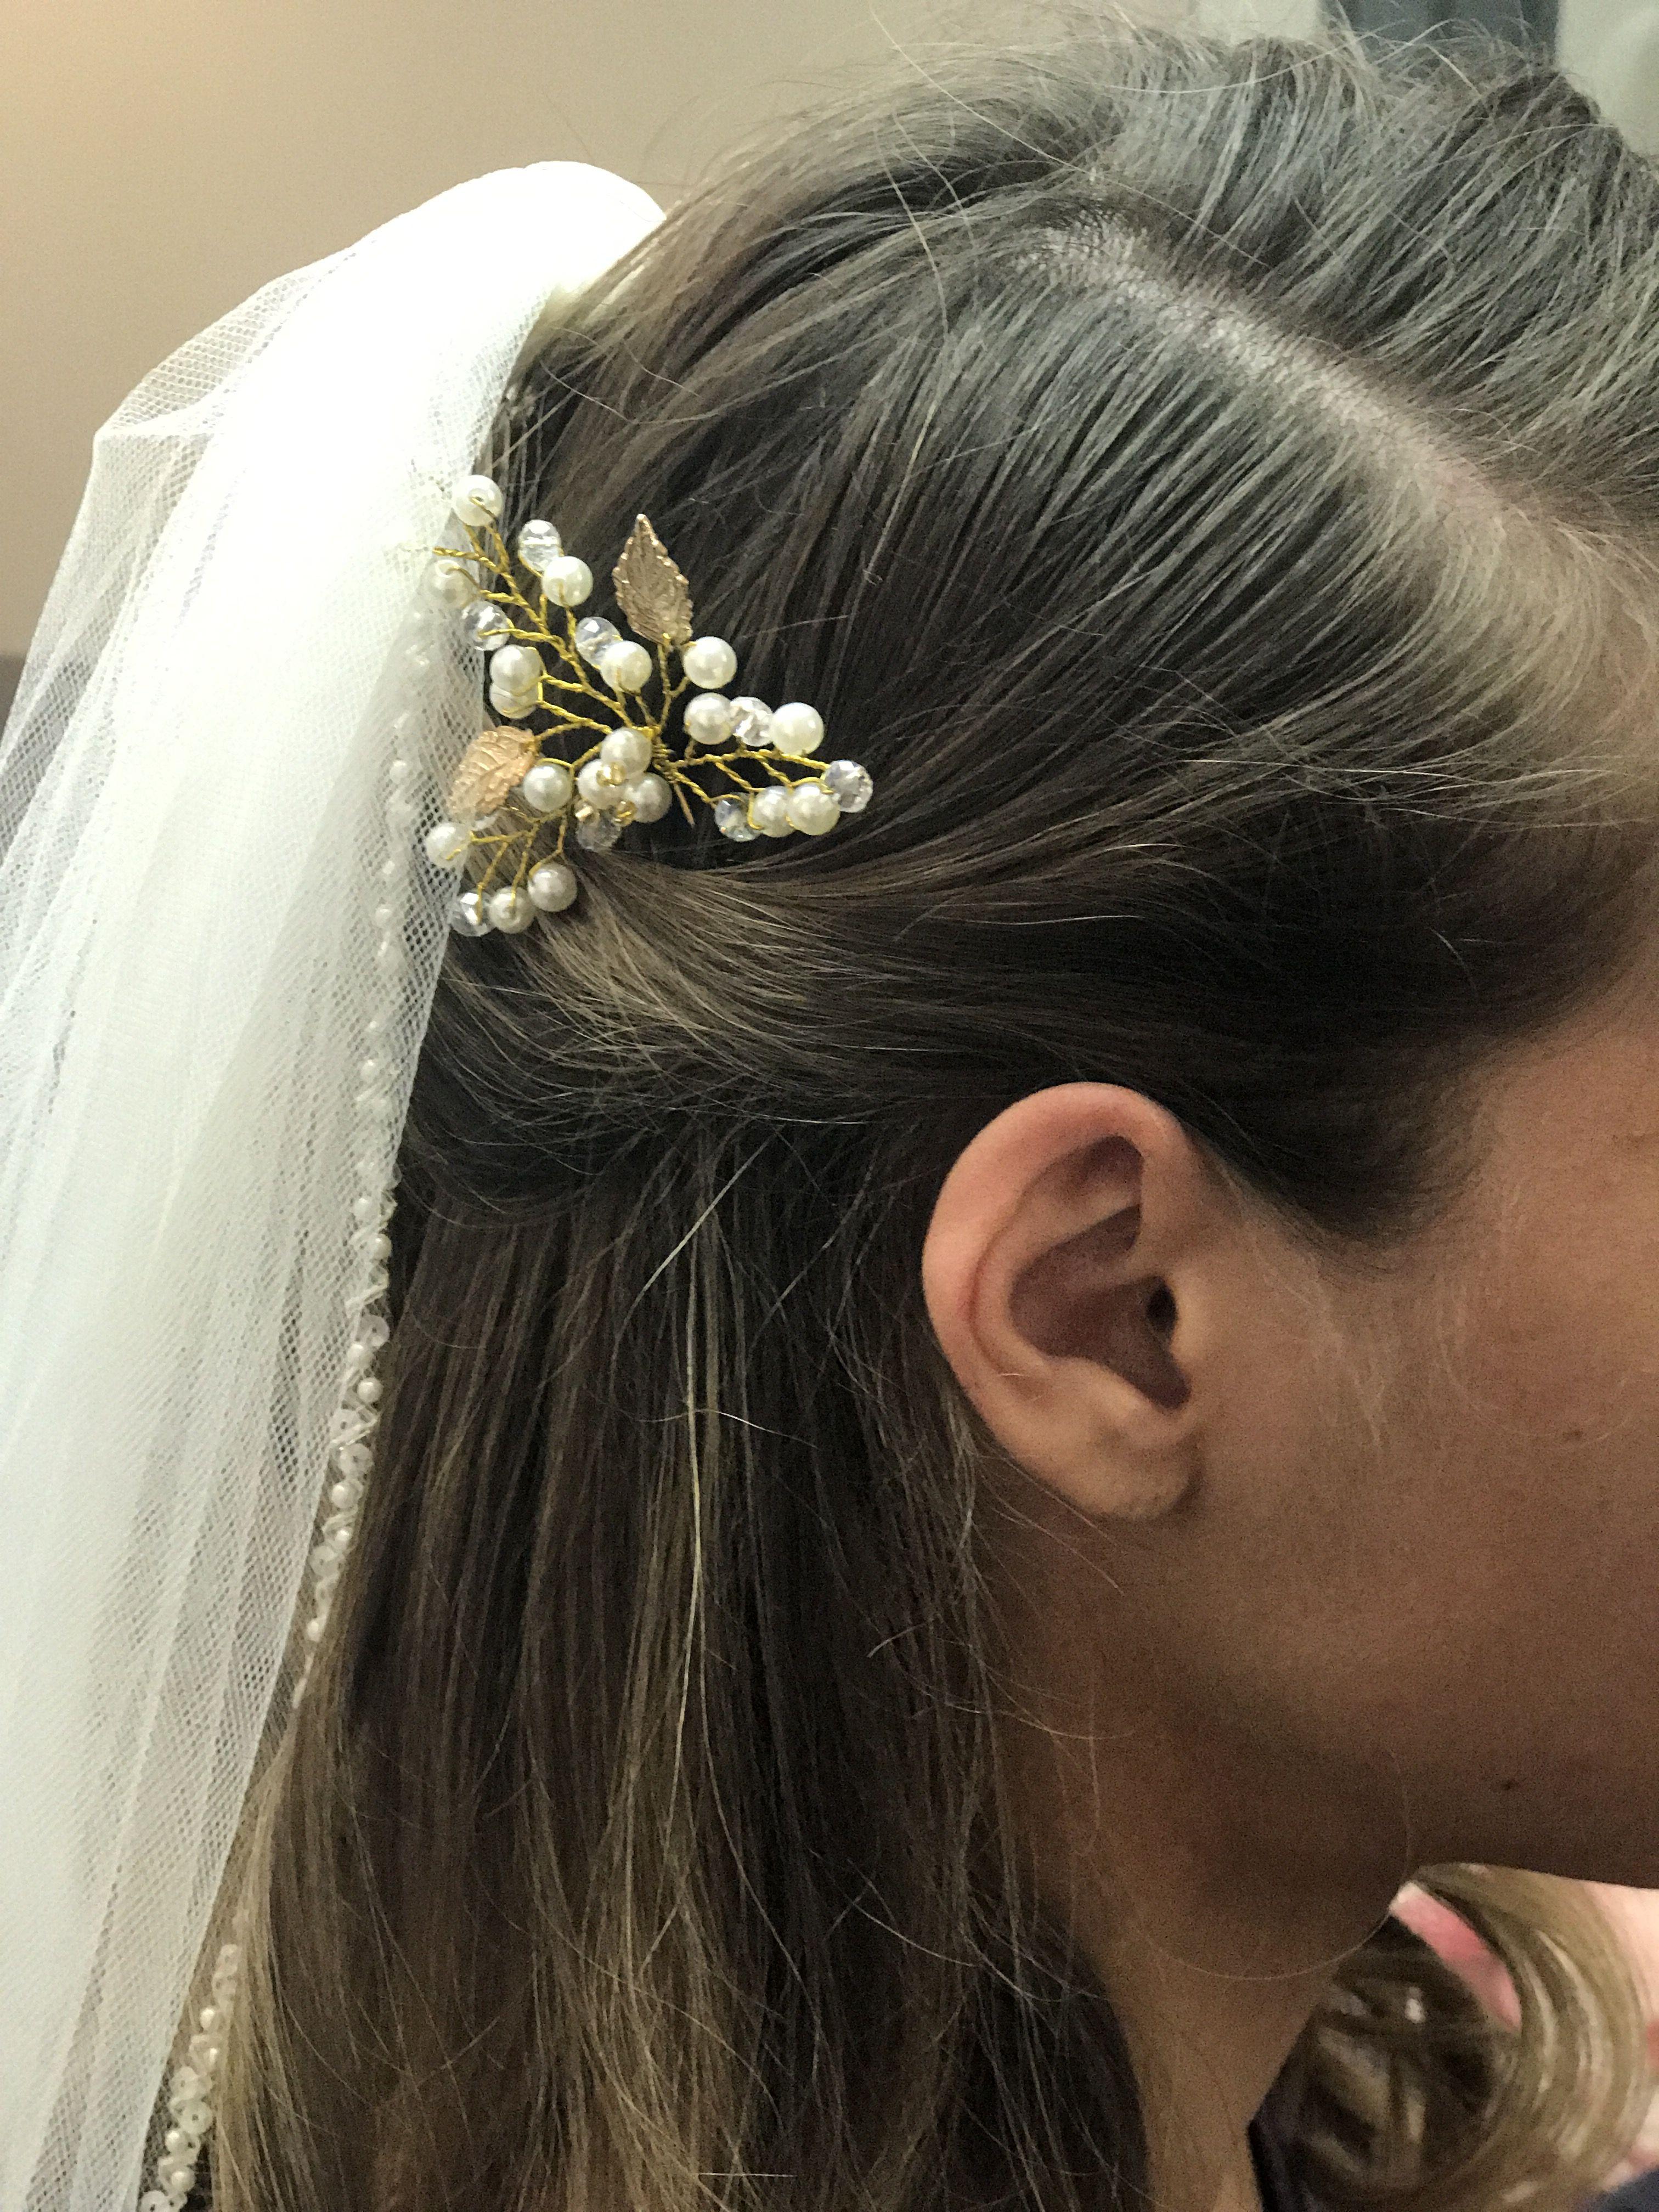 f8b5425bca5d St. Louis Brides https://m.facebook.com/PatriciaElaineSalonStudio/